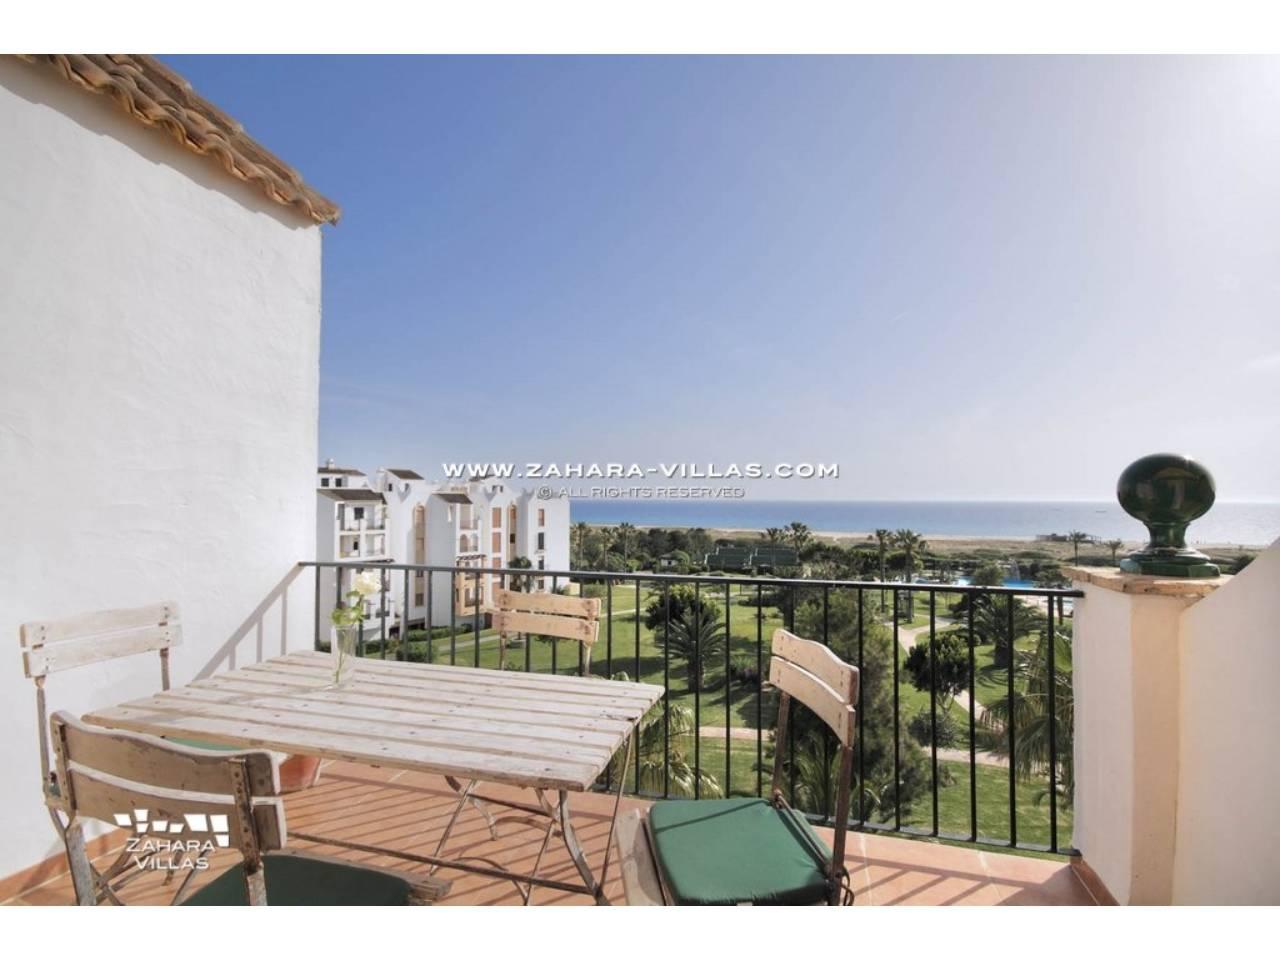 Imagen REF.000422 ubicada en Urb. Atlanterra Playa